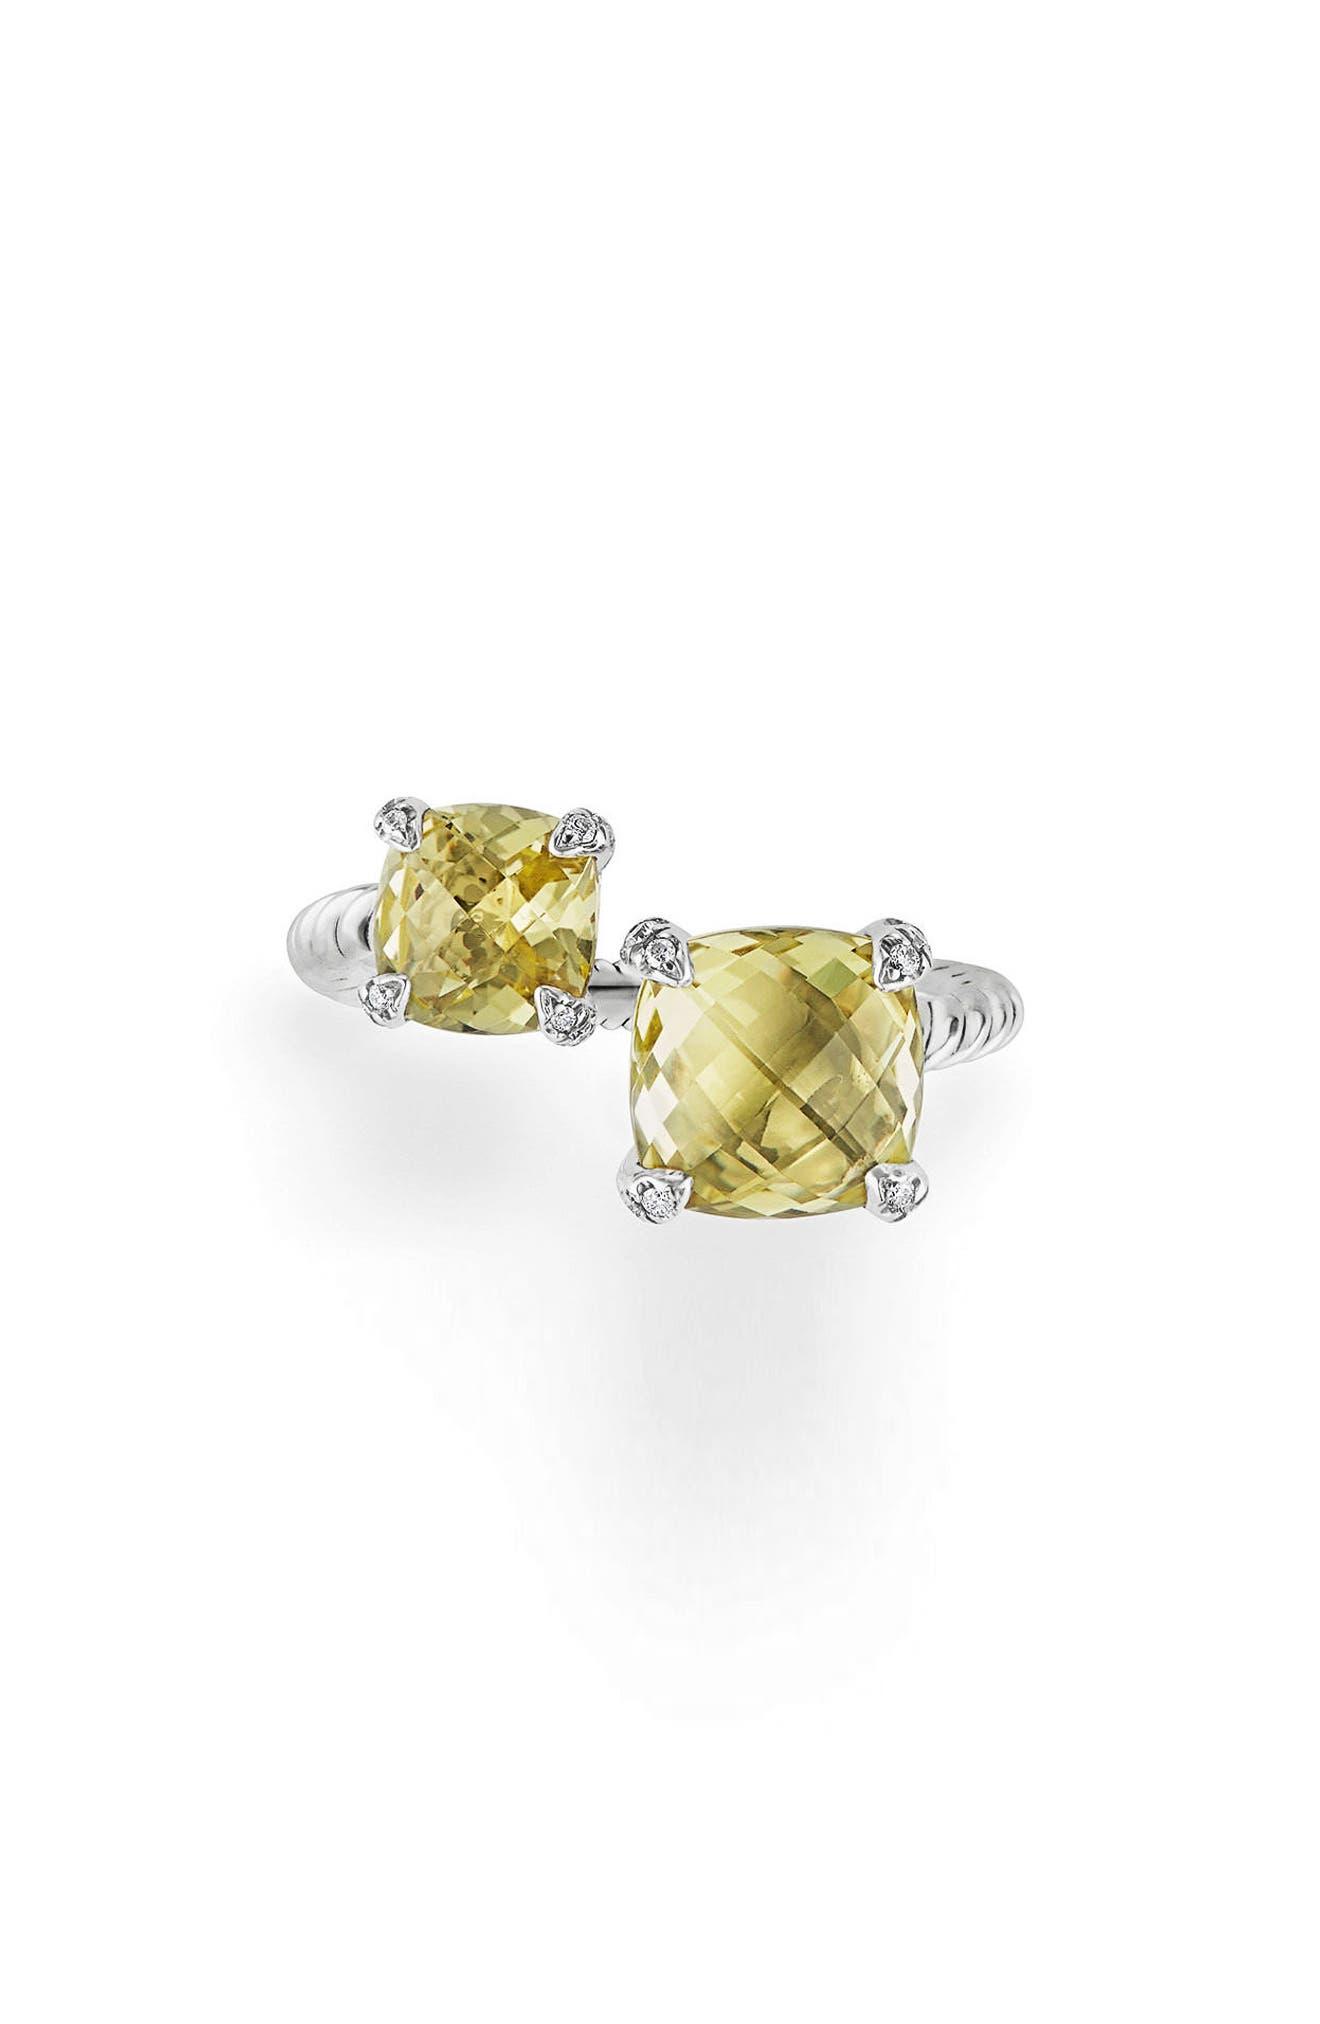 David Yurman Châtelaine Bypass Ring with Diamonds